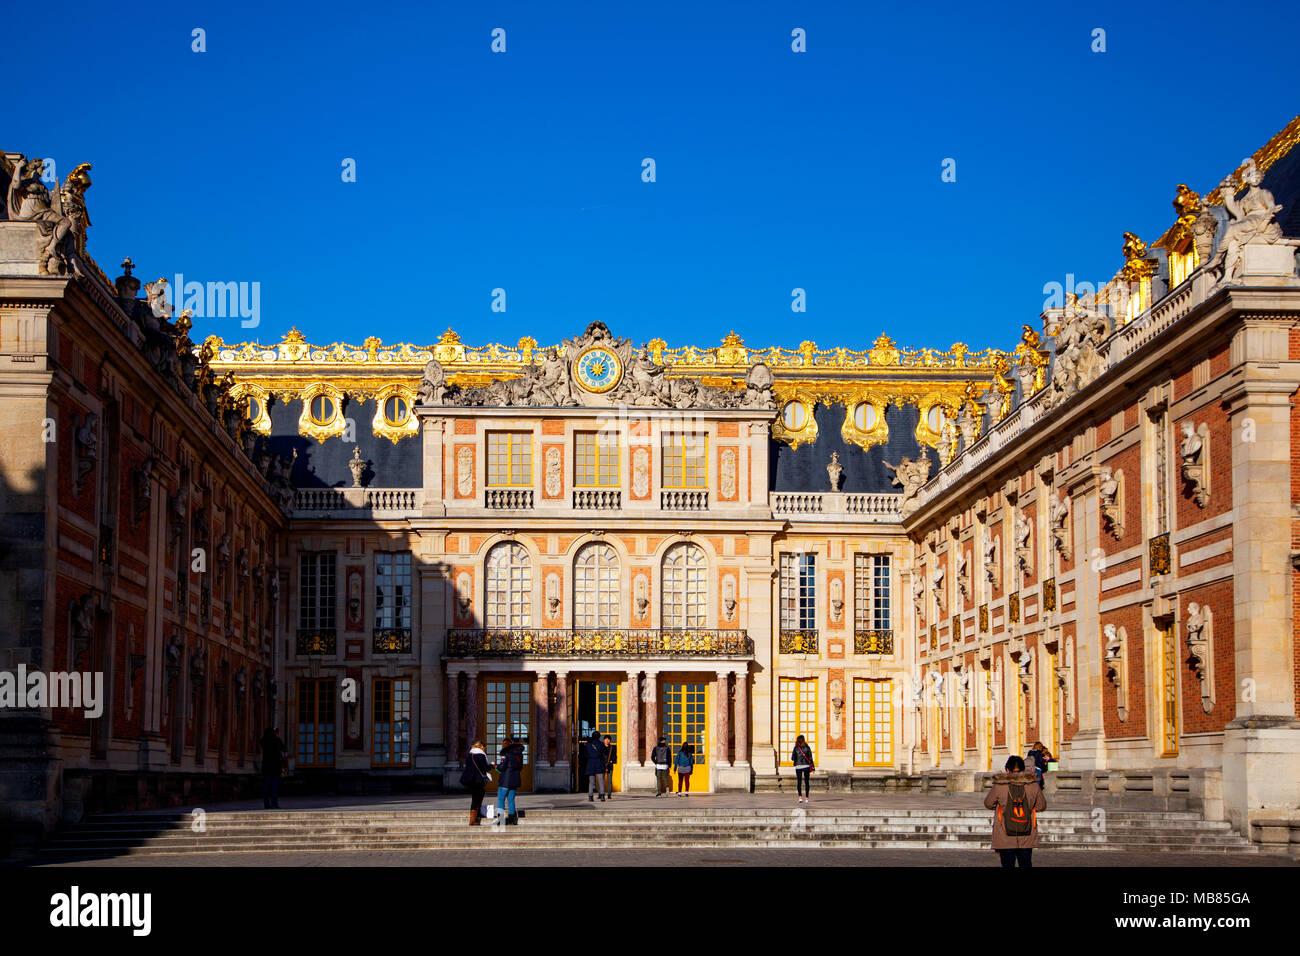 Chateau de Versailles (Palace of Versailles), a UNESCO World Heritage Site, France - frontal aspect - Stock Image